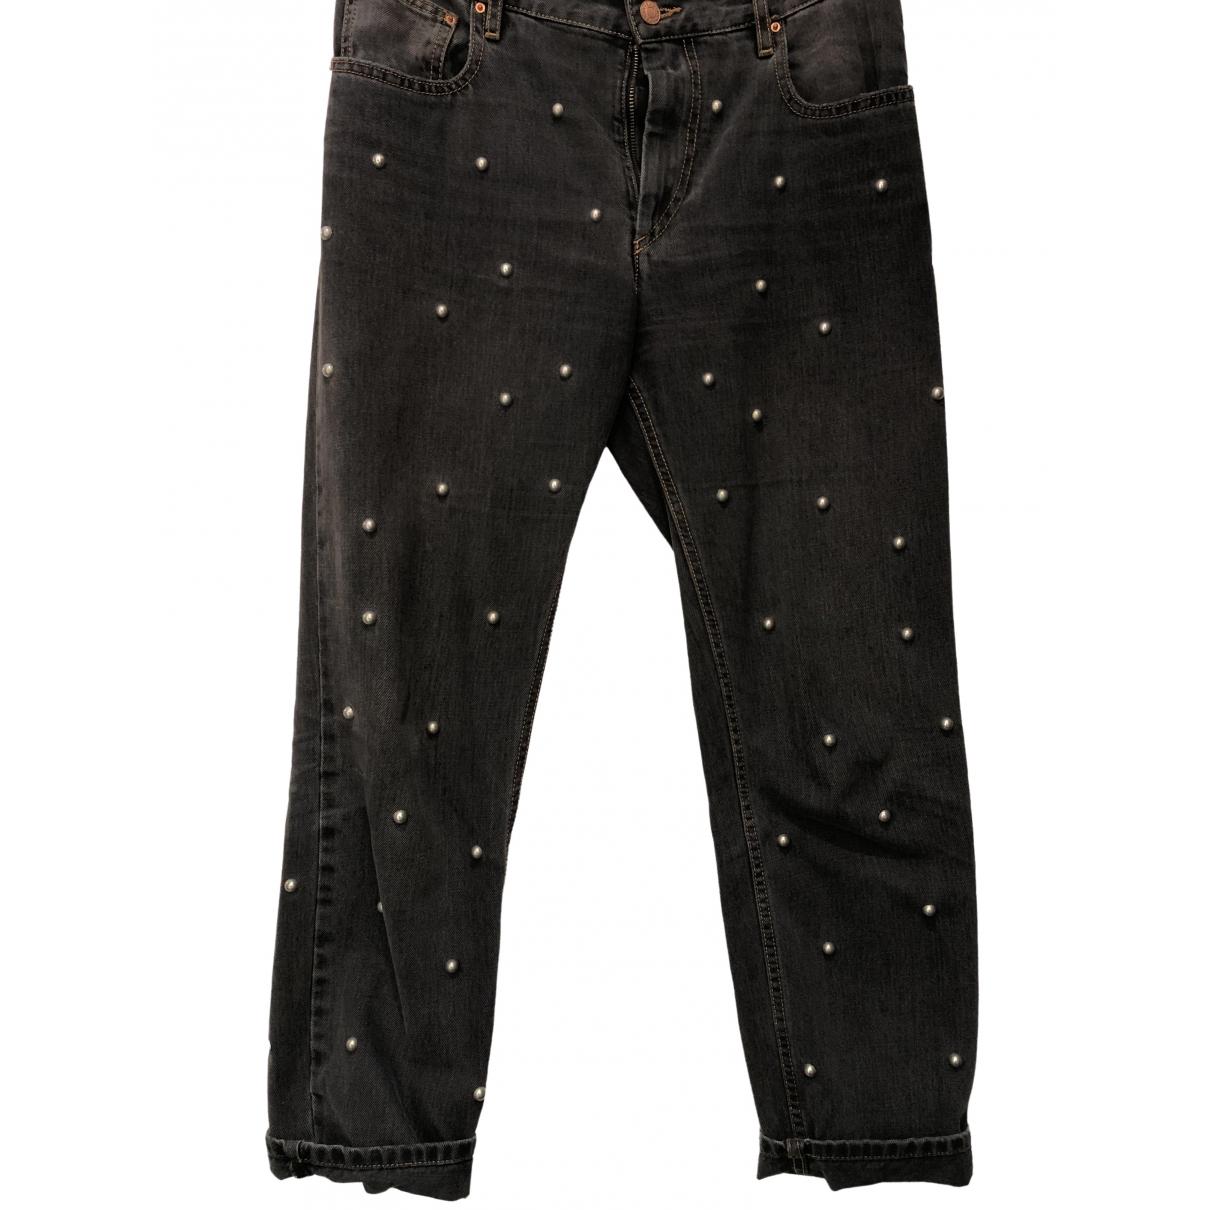 Isabel Marant Etoile \N Anthracite Denim - Jeans Jeans for Women 38 FR